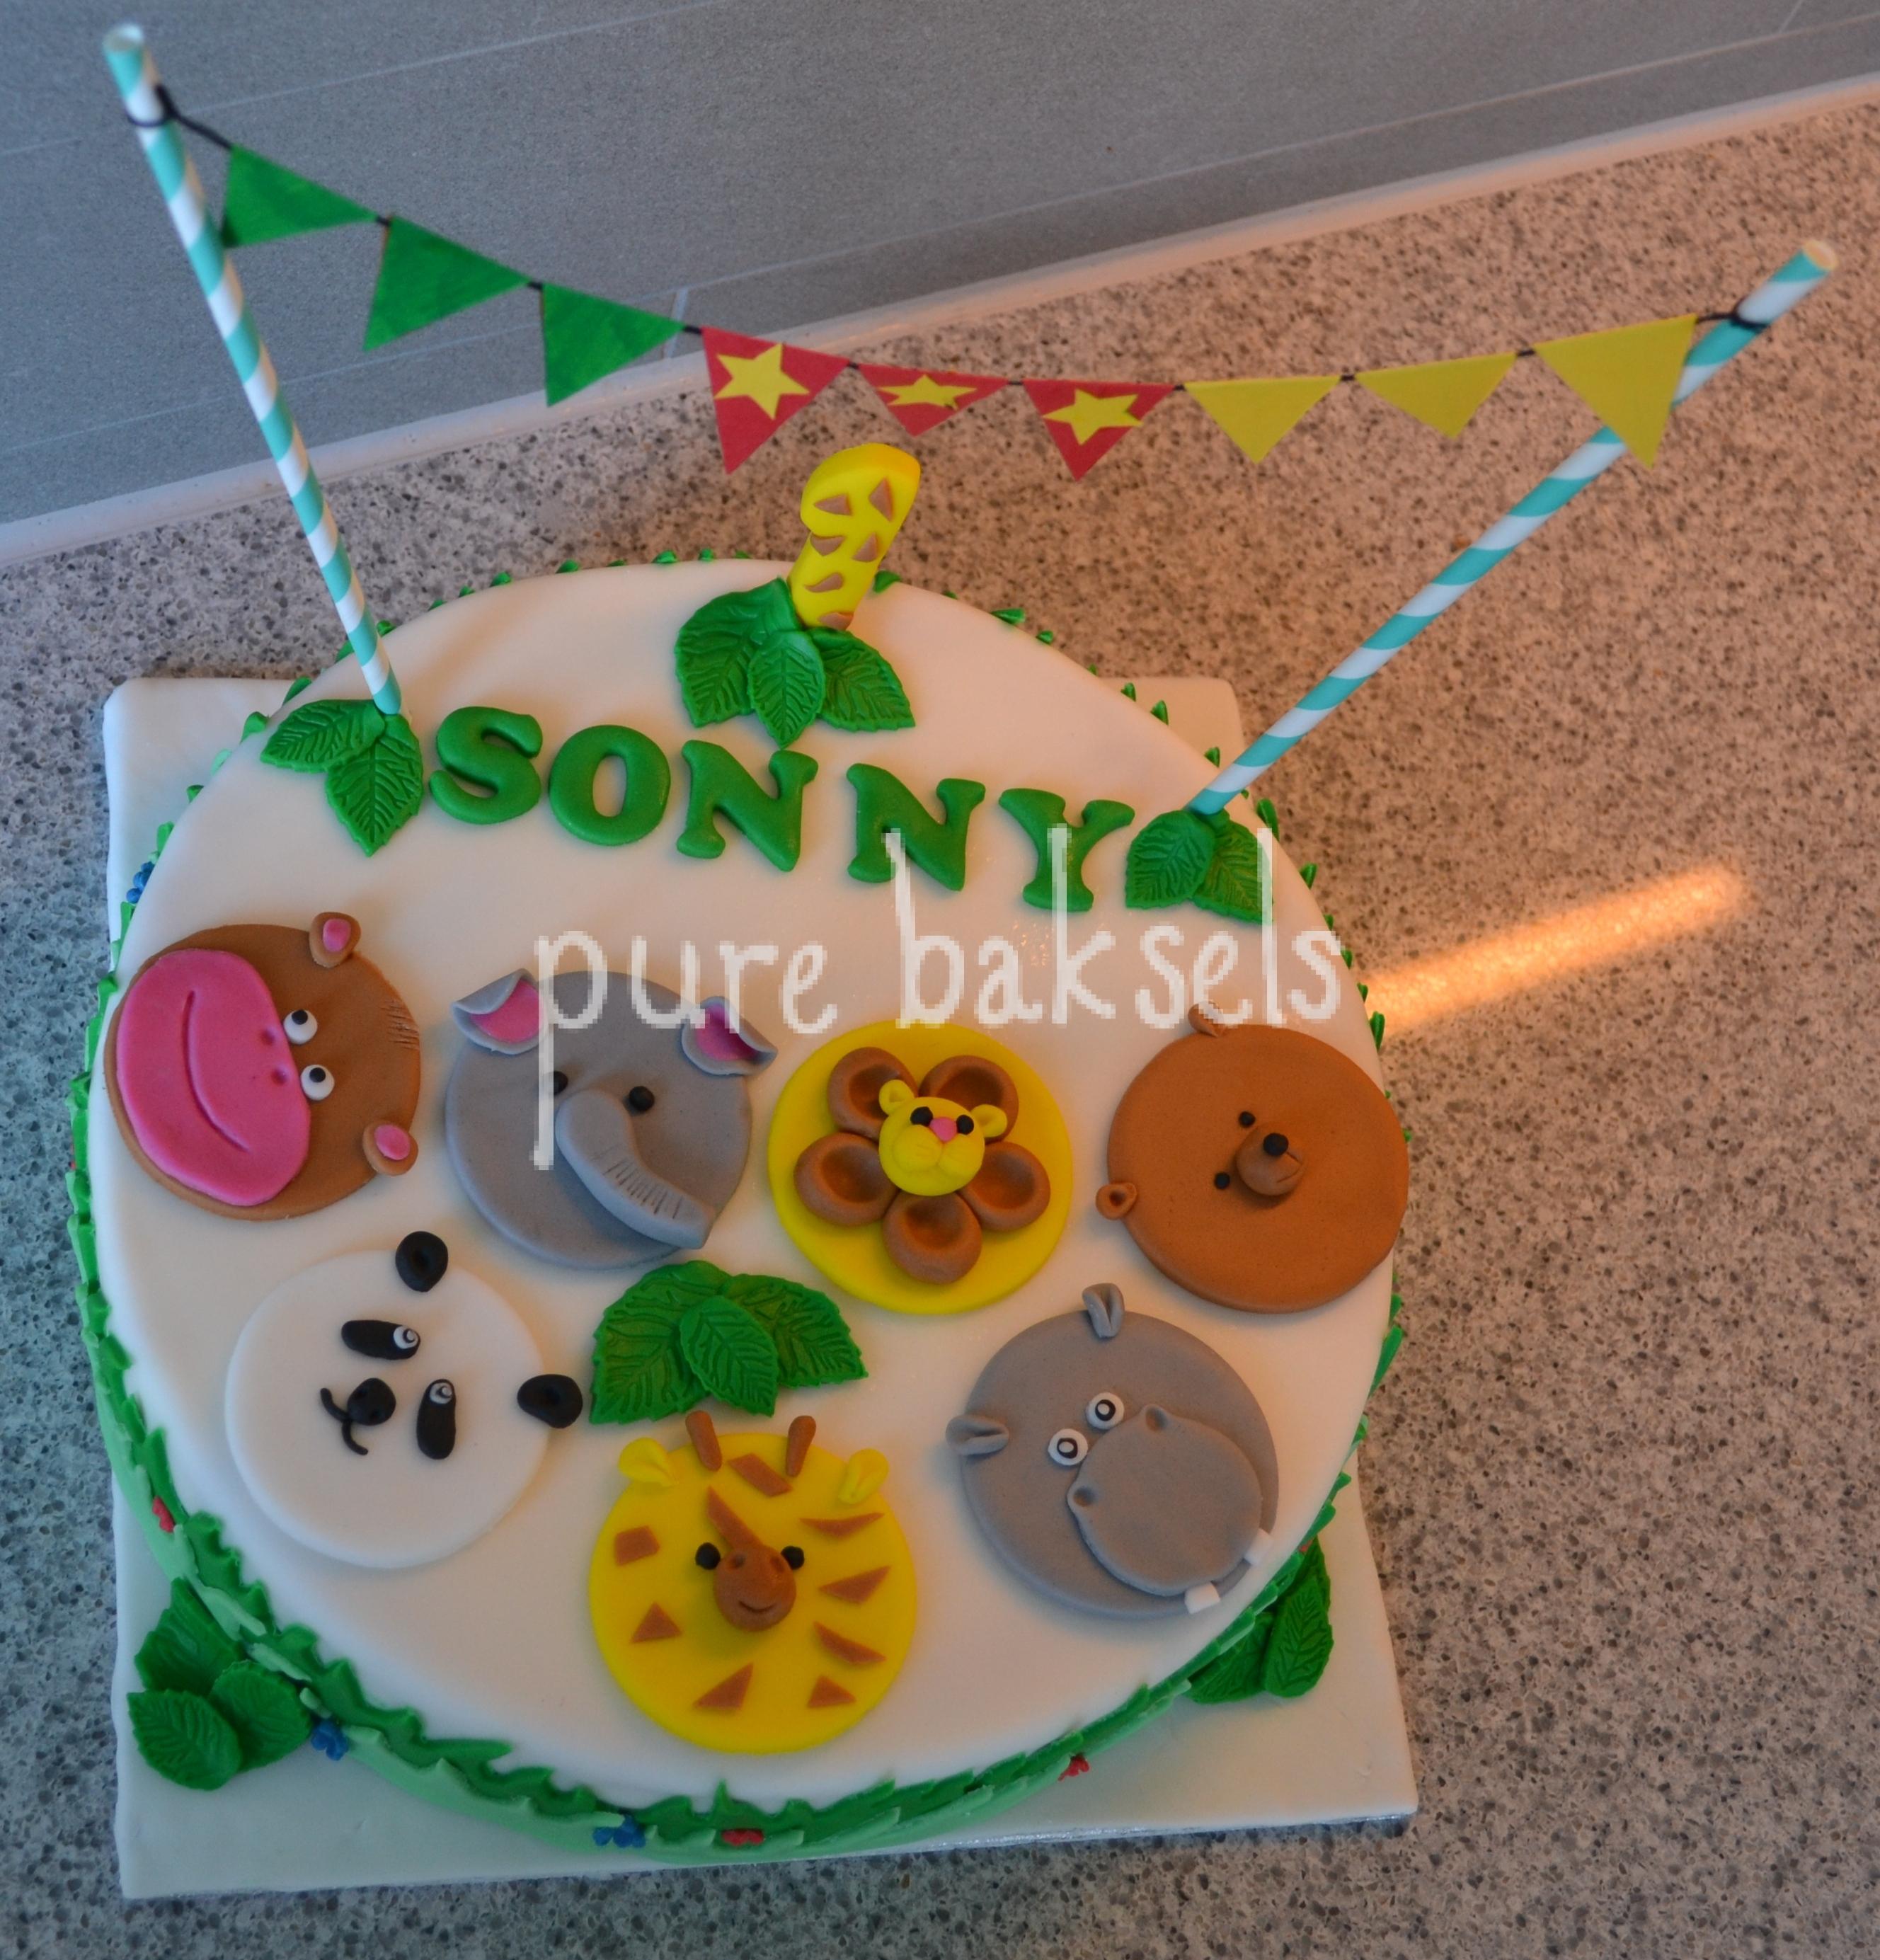 Jungle taart Sonny (2)